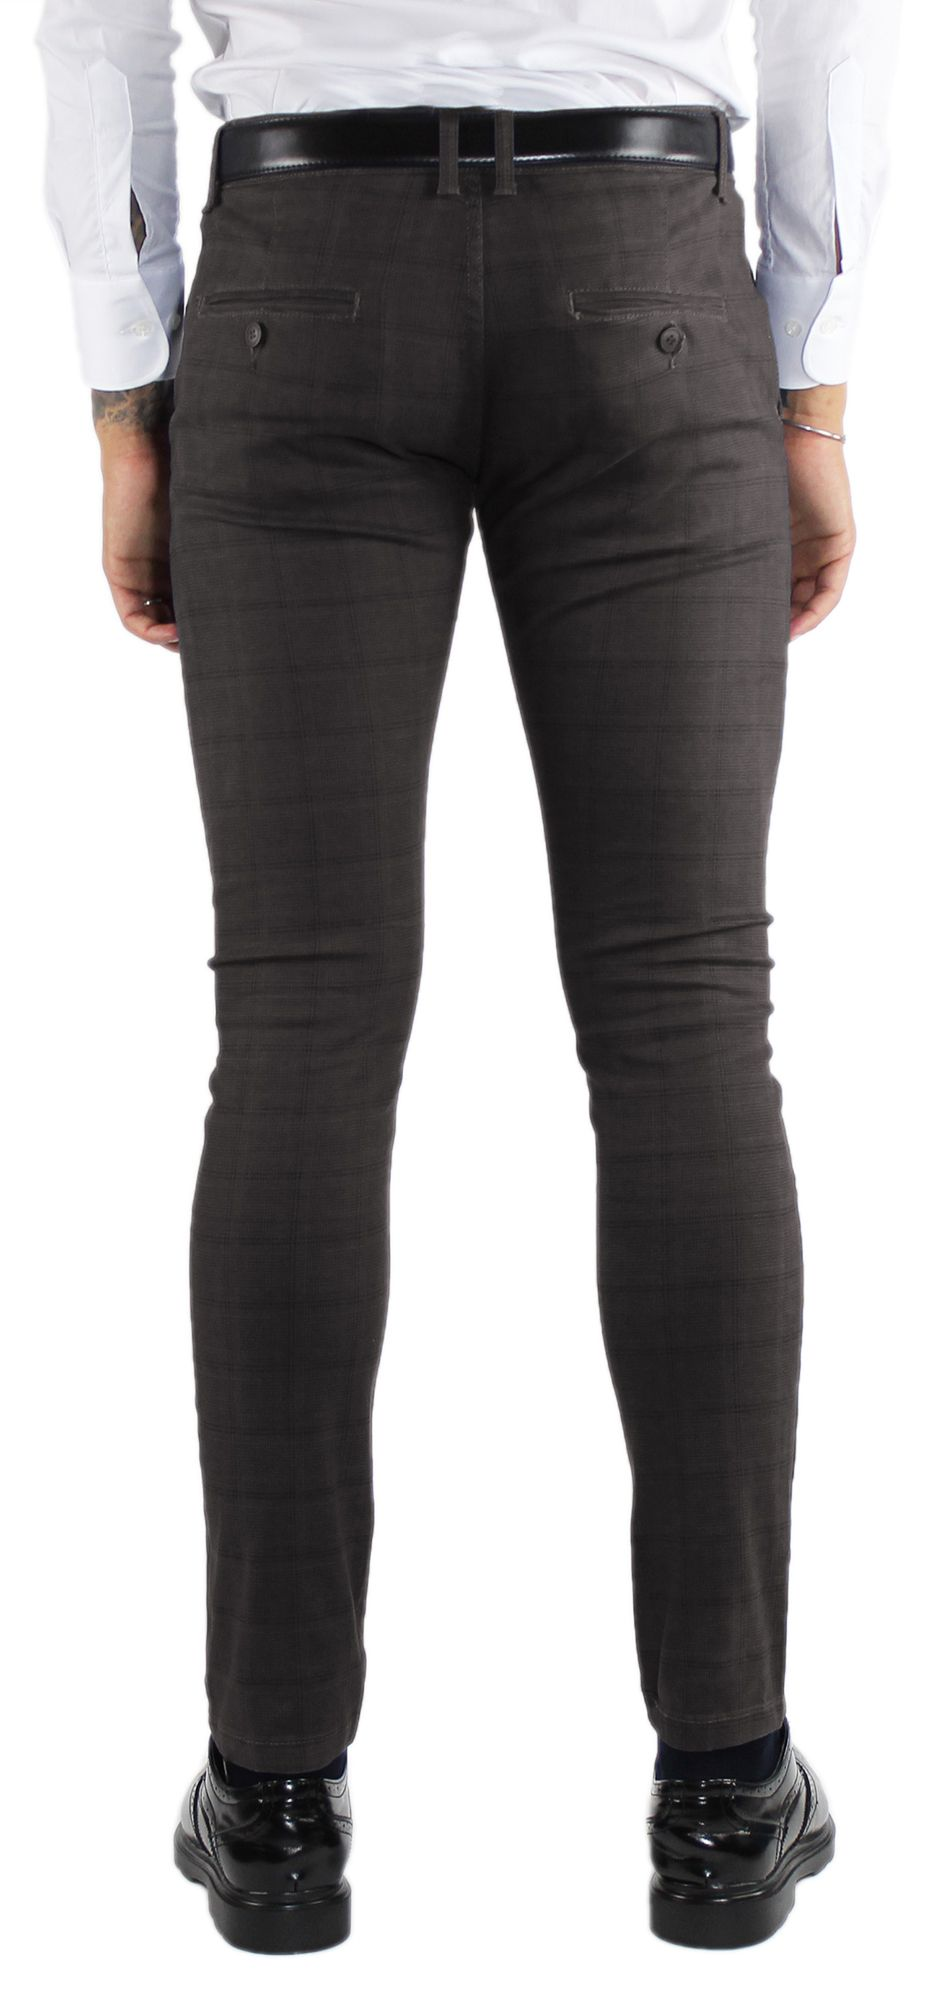 Pantaloni-Uomo-Invernali-a-Quadri-Eleganti-Pantalone-Slim-Fit-Elasticizzati-Scoz miniatura 17